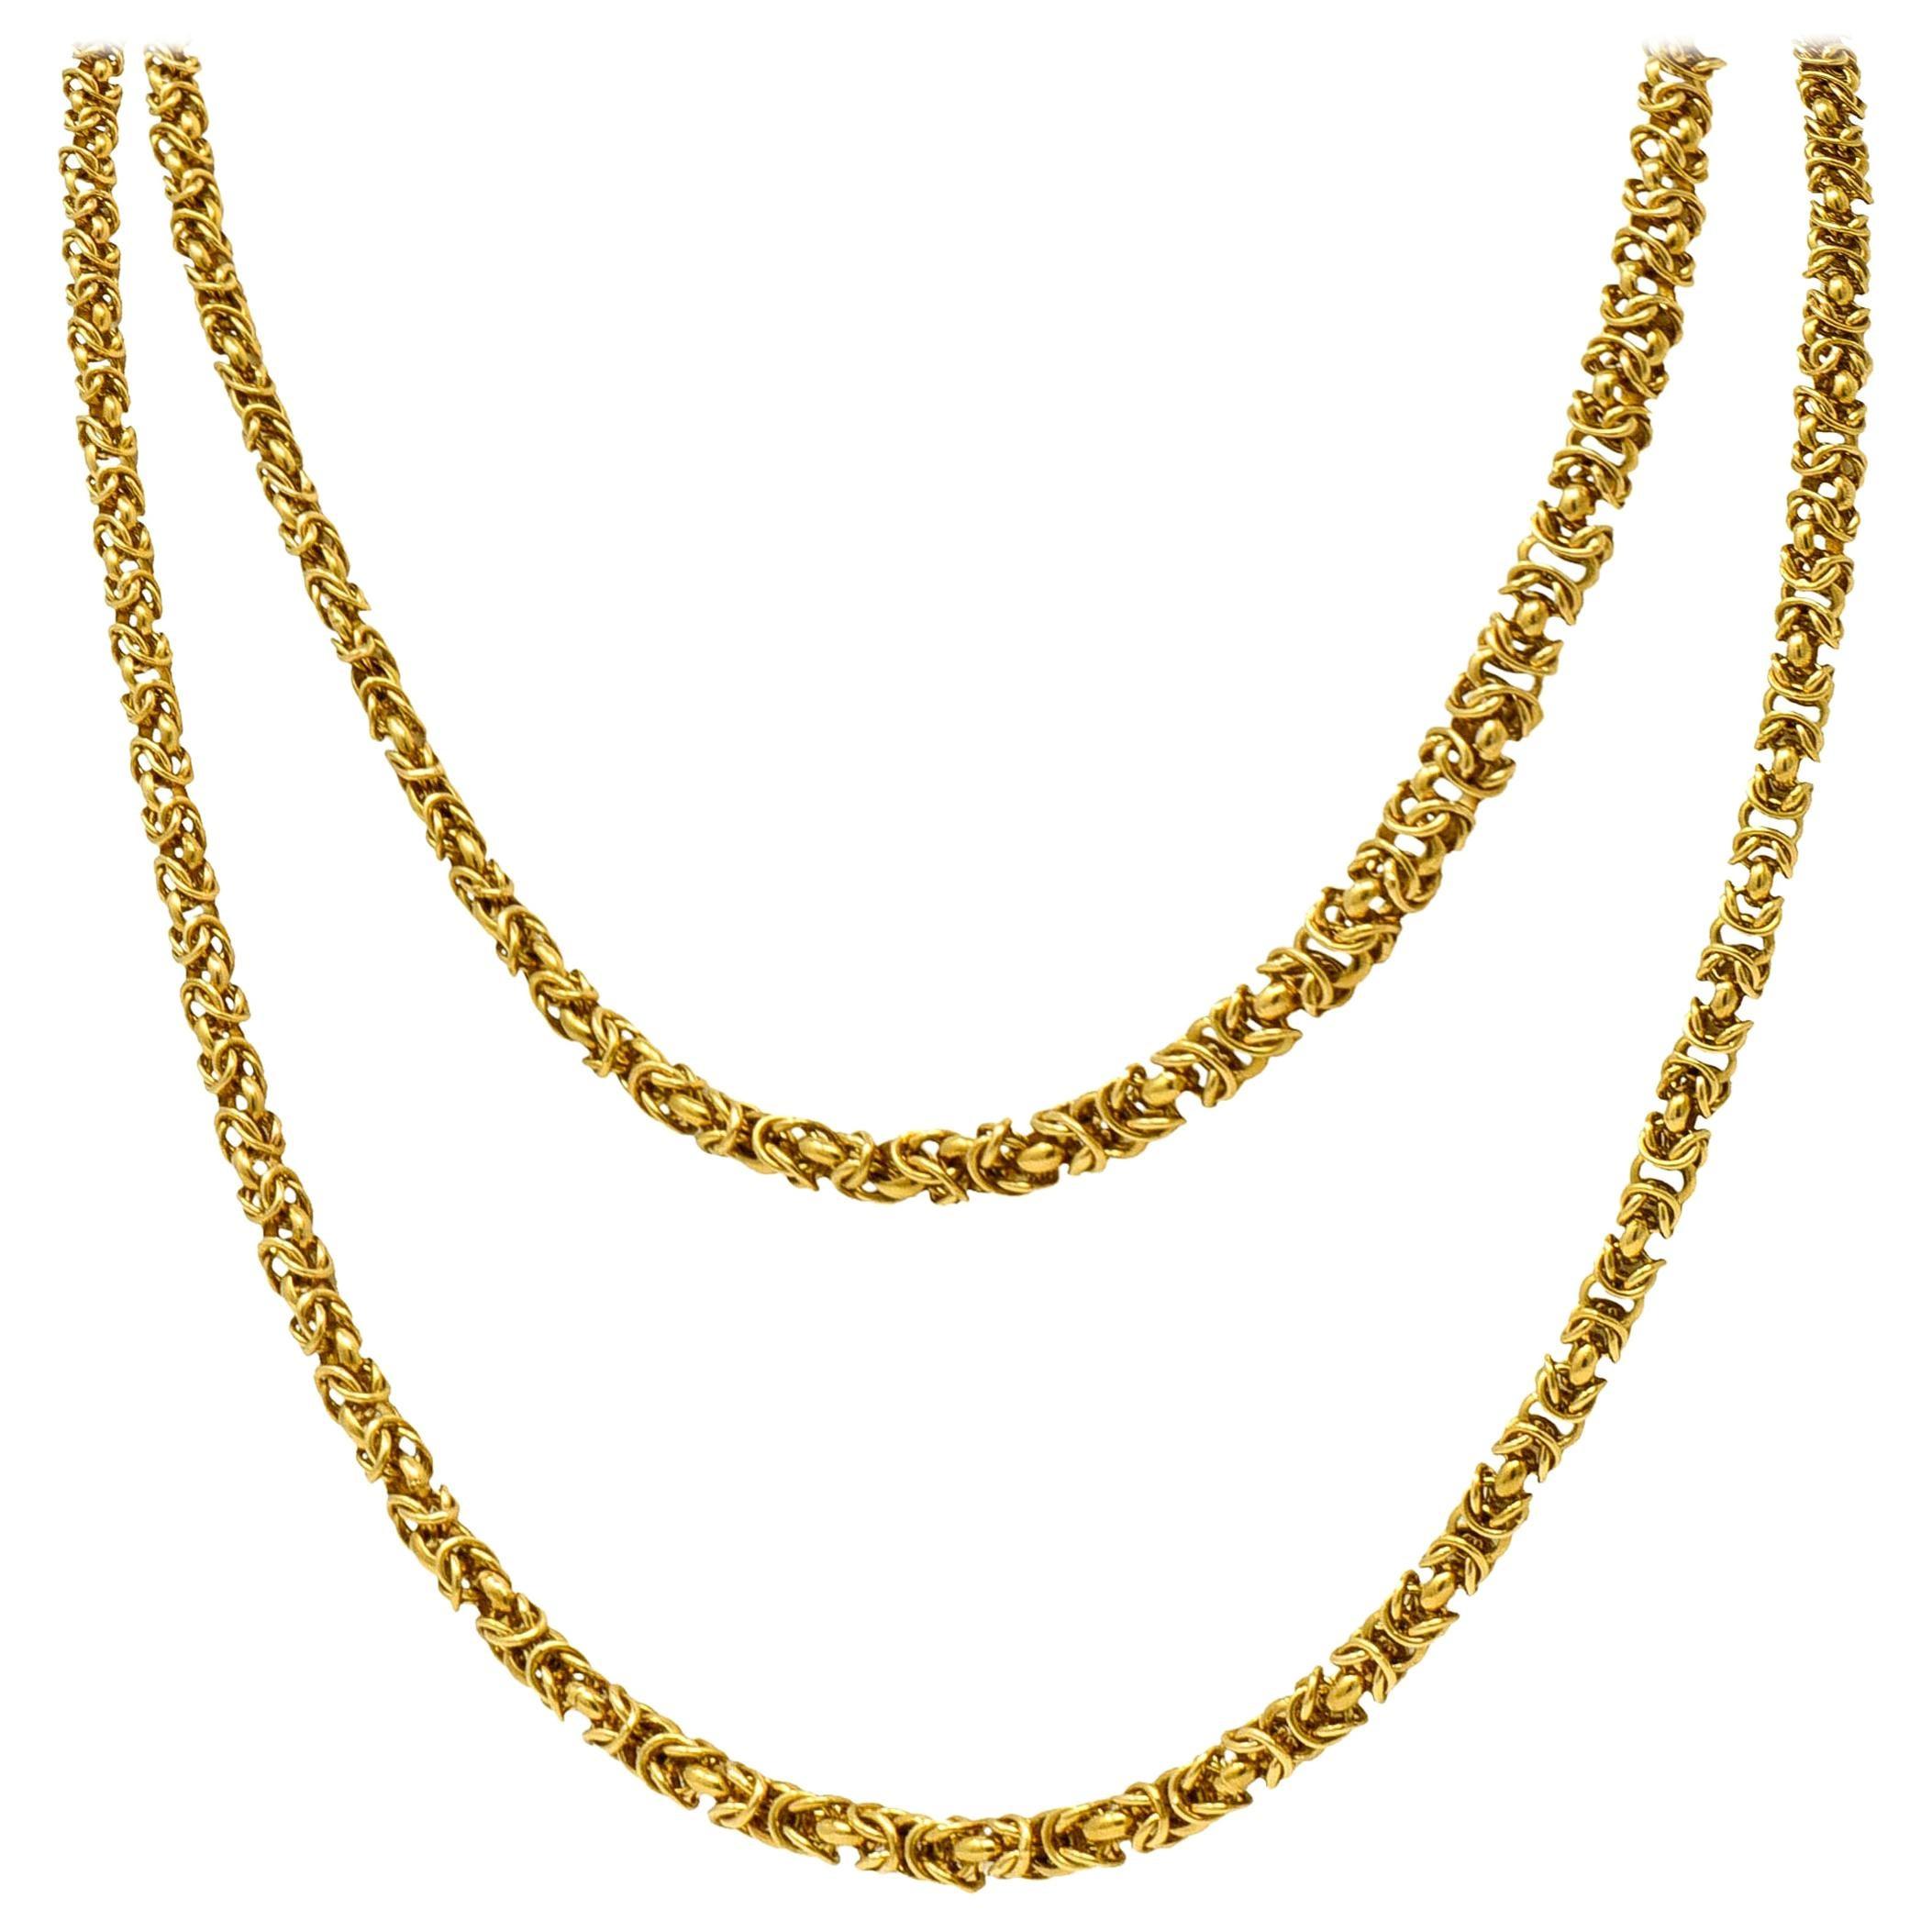 Vintage 18 Karat Yellow Gold Byzantine Long Chain Necklace